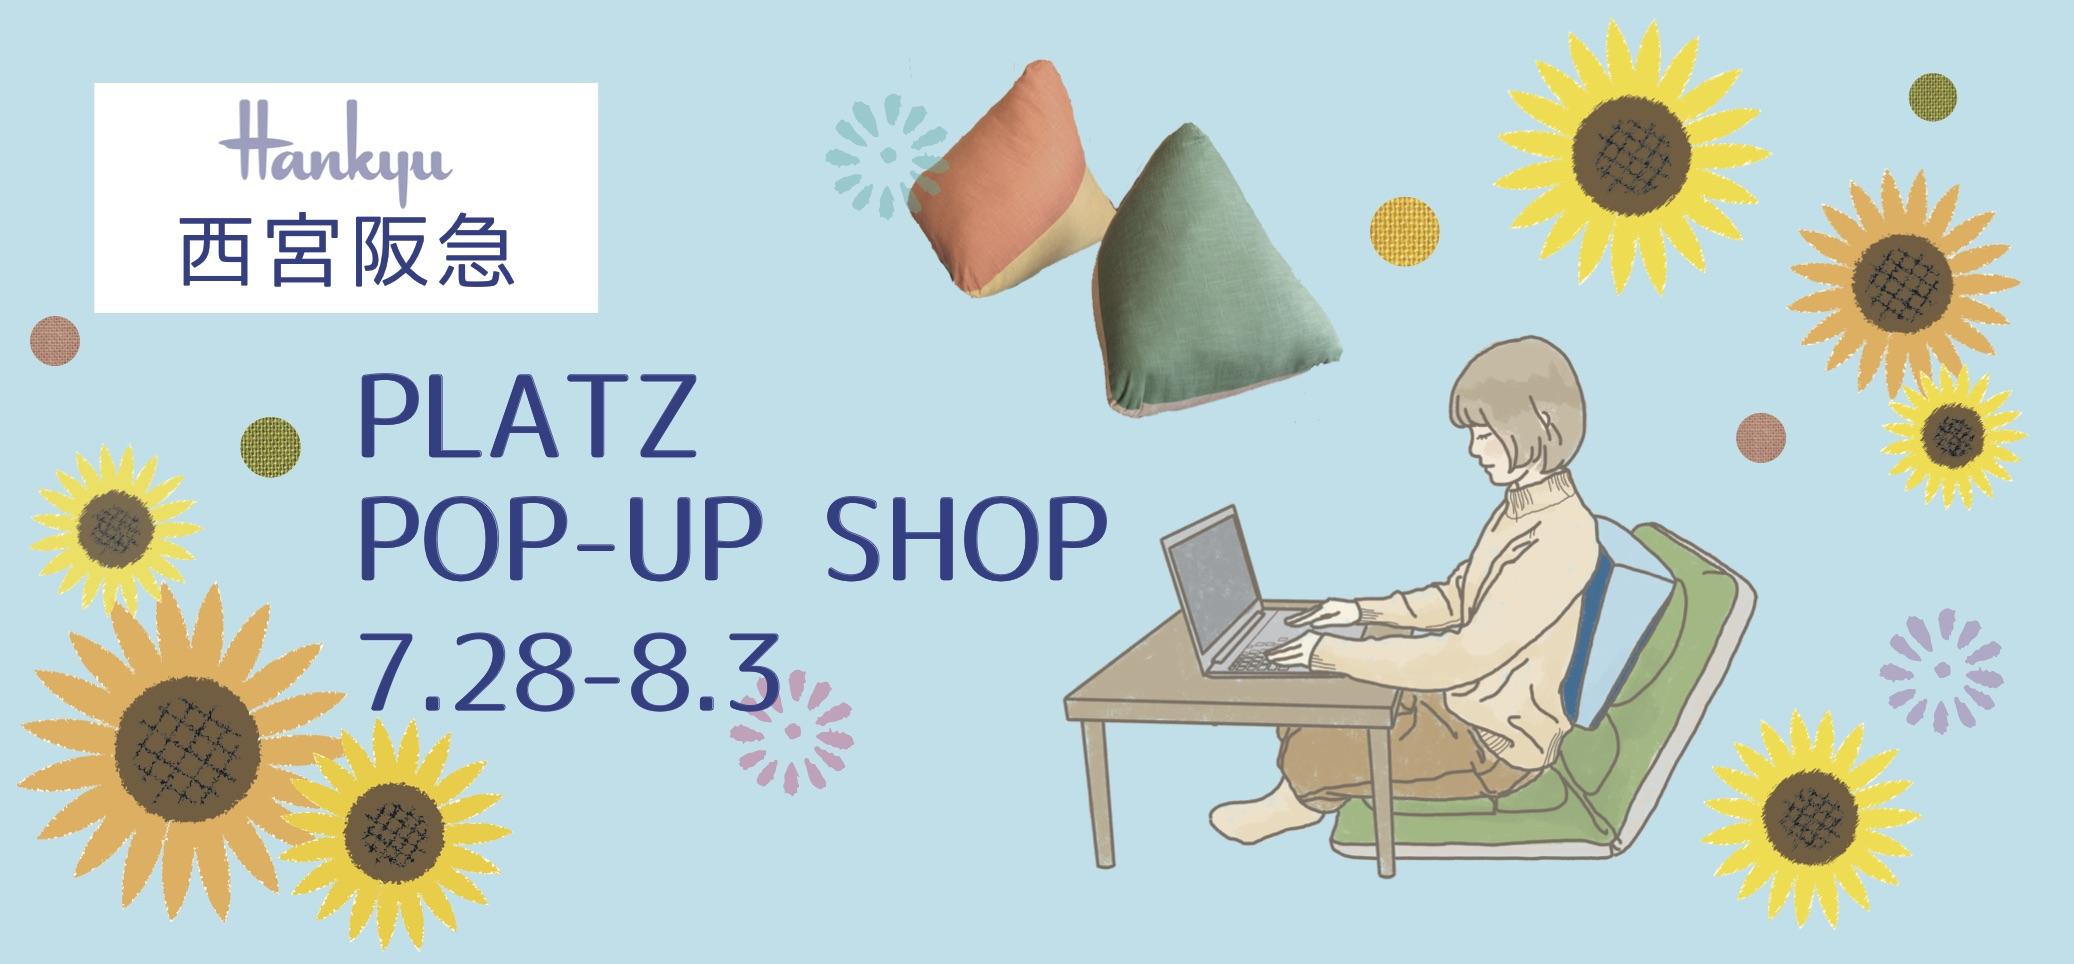 http://www.kyoto-platz.jp/news/images/%E8%A5%BF%E5%AE%AE%E9%98%AA%E6%80%A5HP.jpg